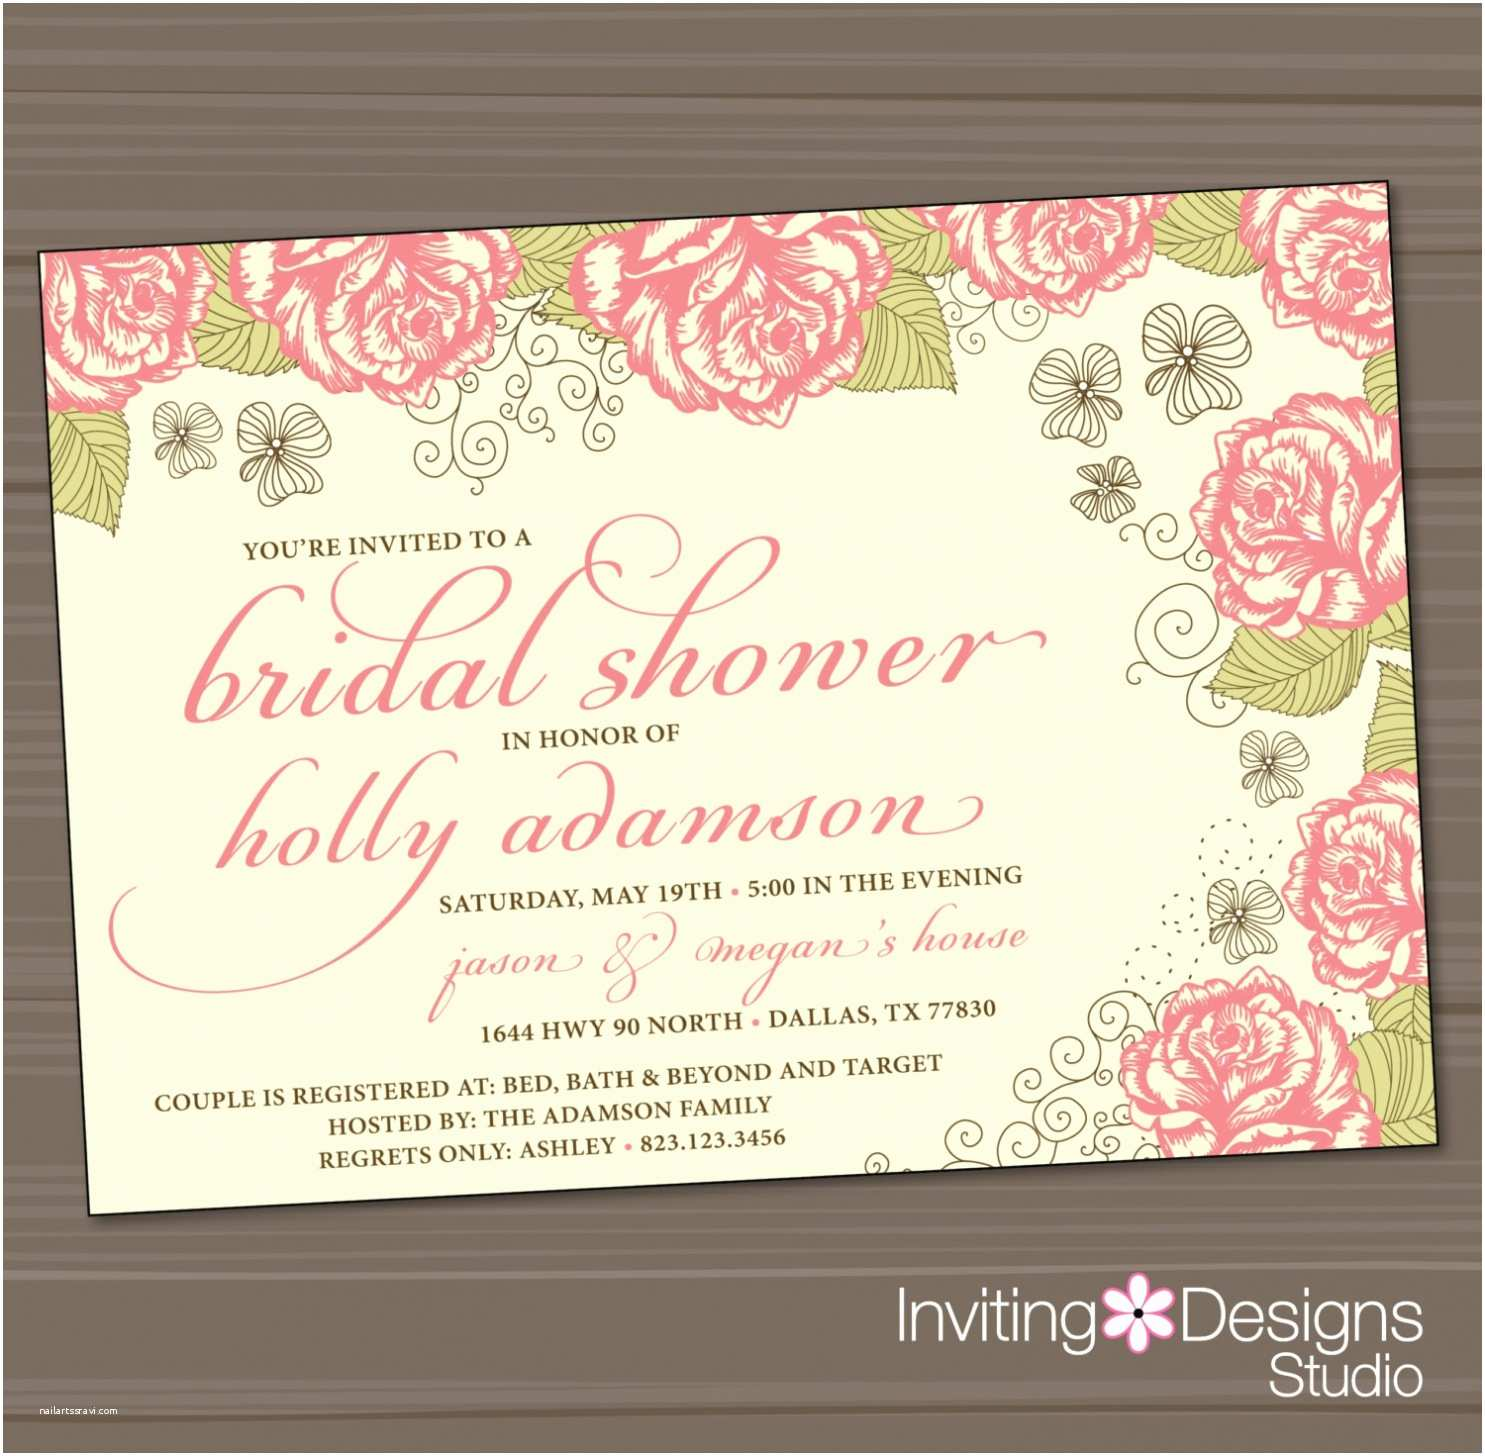 Costco Wedding Invitations Costco Wedding Invitations Line Various Invitation